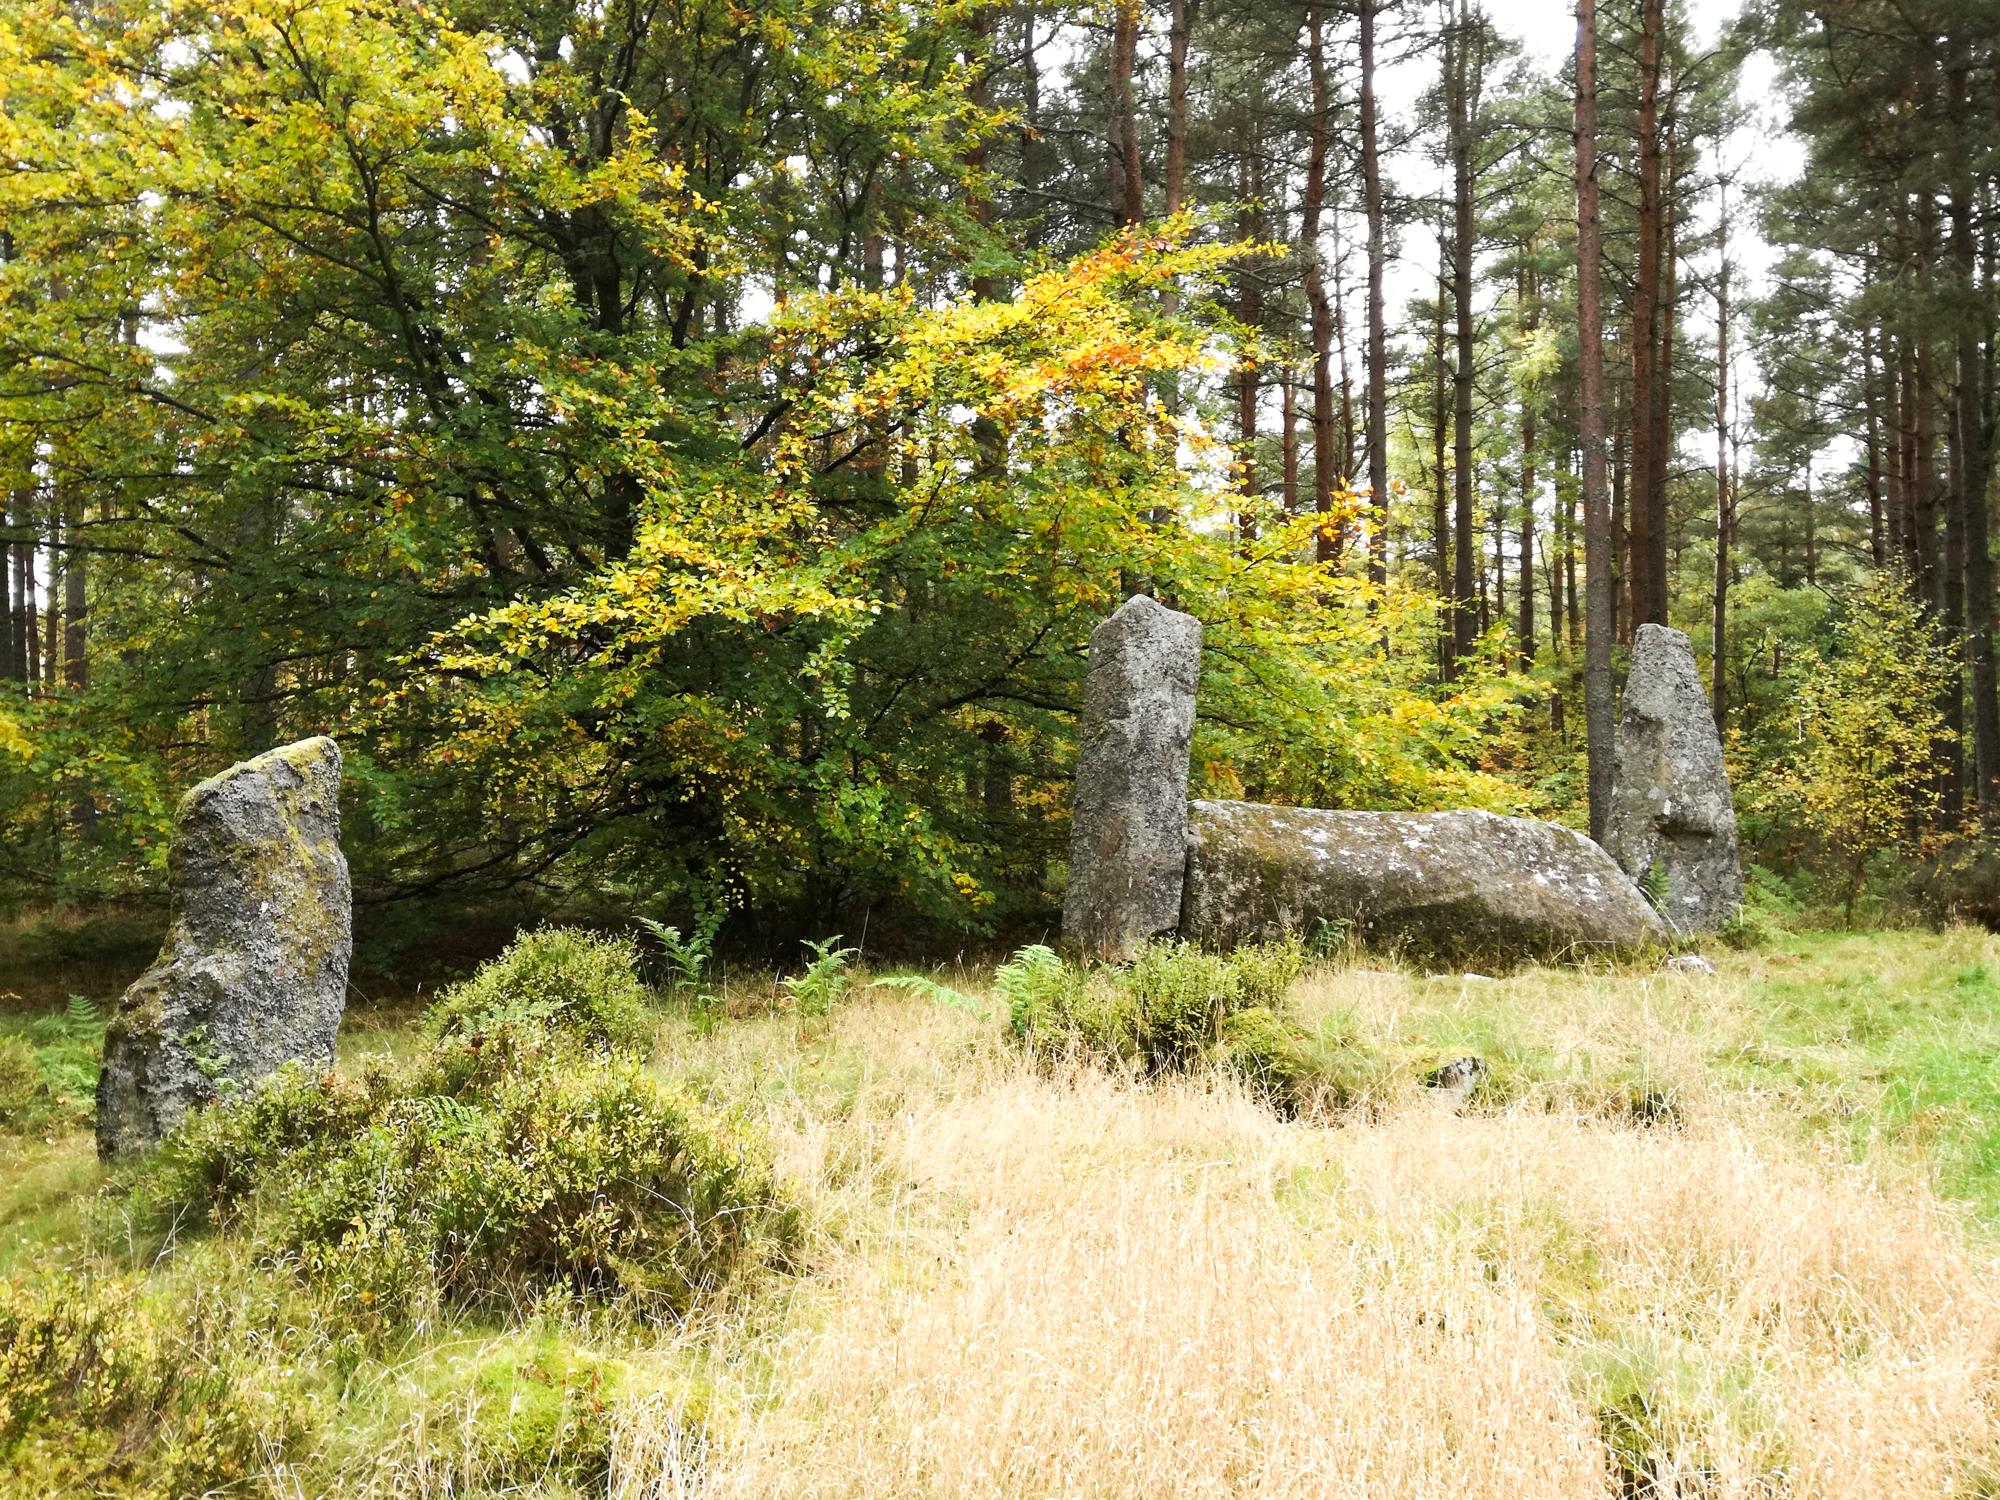 Cothiemuir Stone Circle